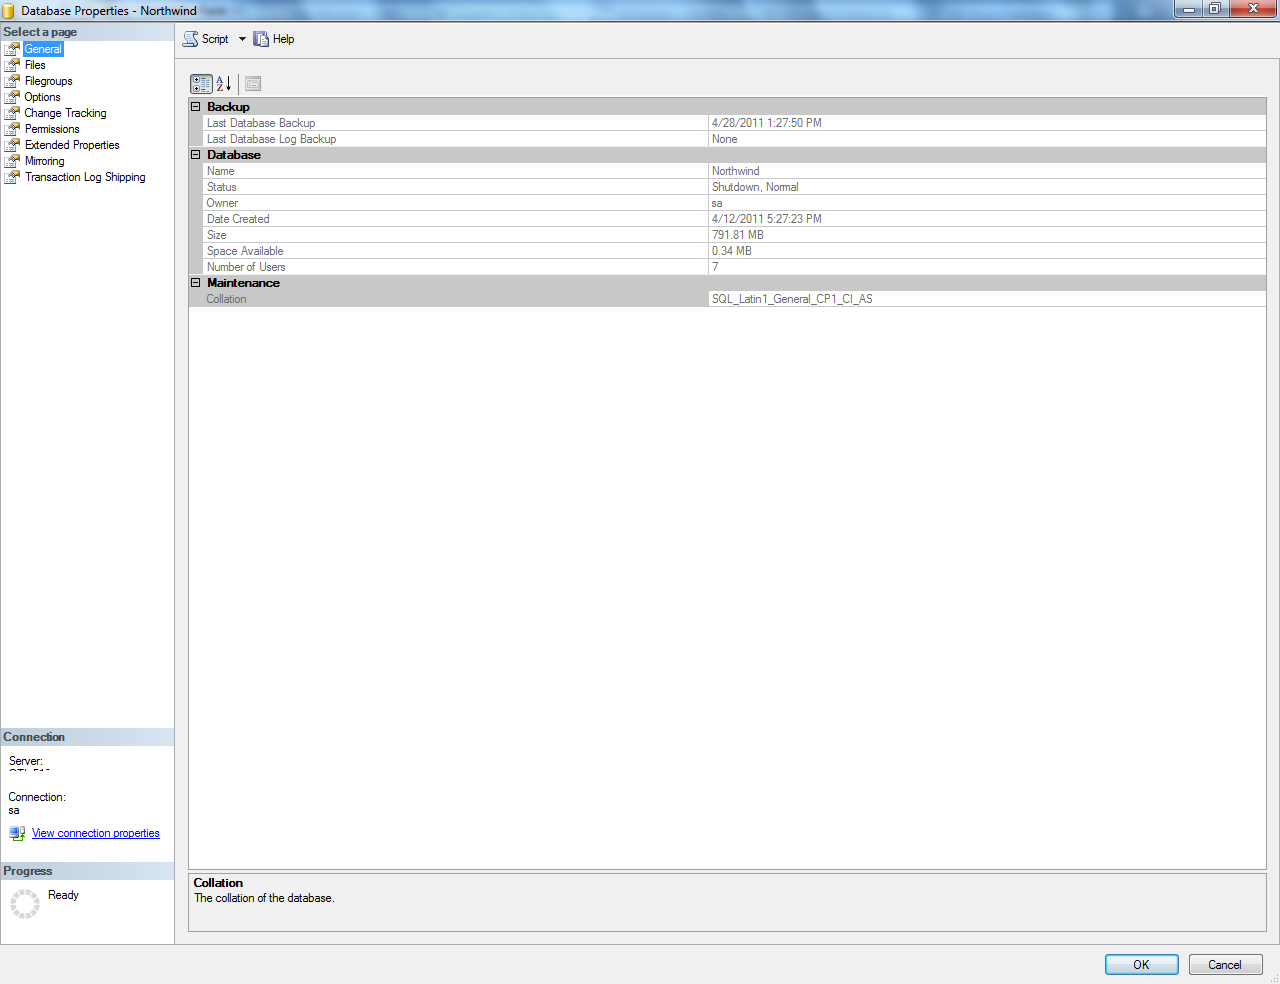 SQL Server Database - showing and understanding properties